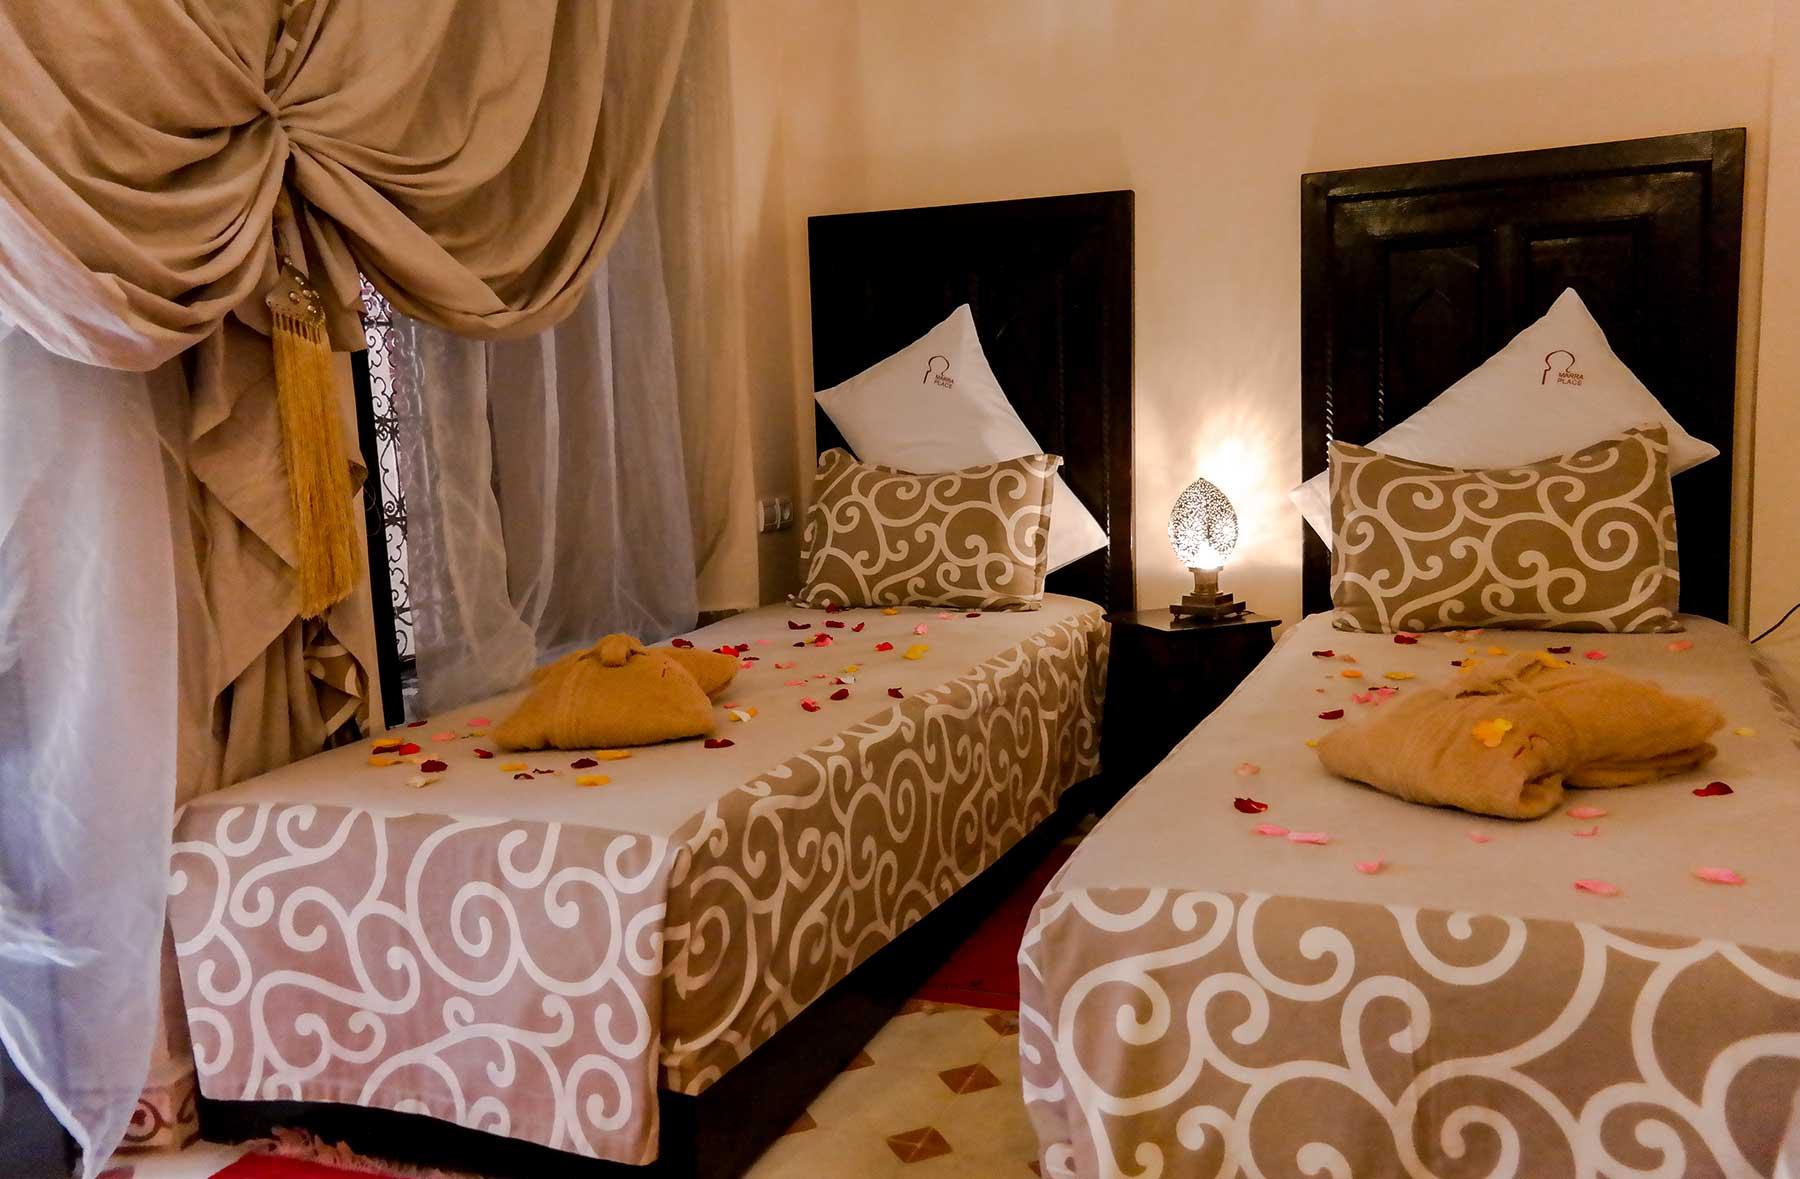 Chambre lits jumeaux berb re marraplace riad h tel - Prix chambre hotel mamounia marrakech ...